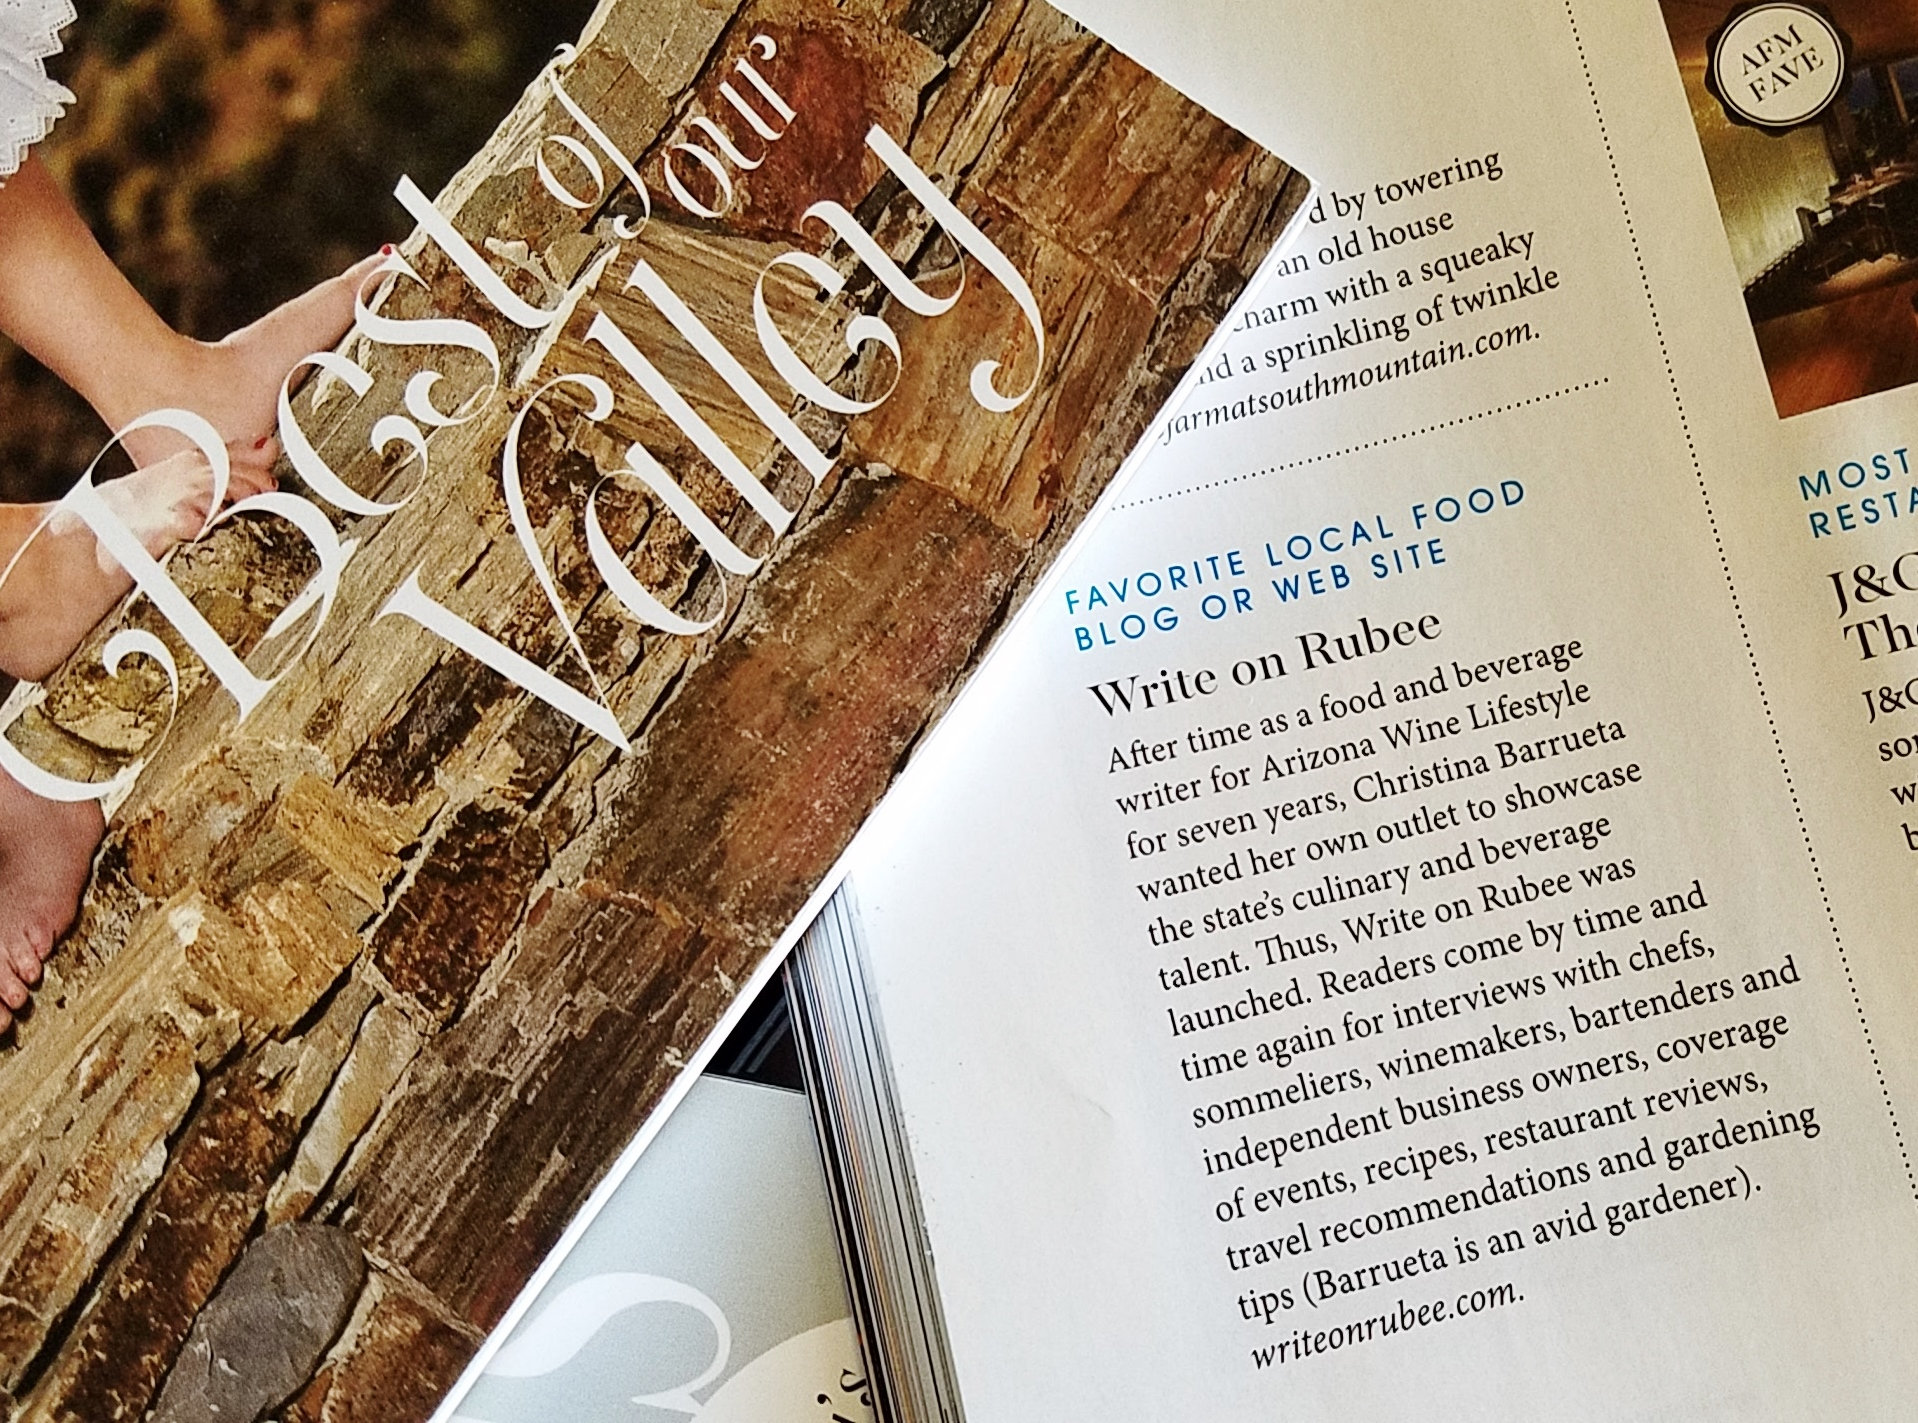 Write On Rubee Best Food Website